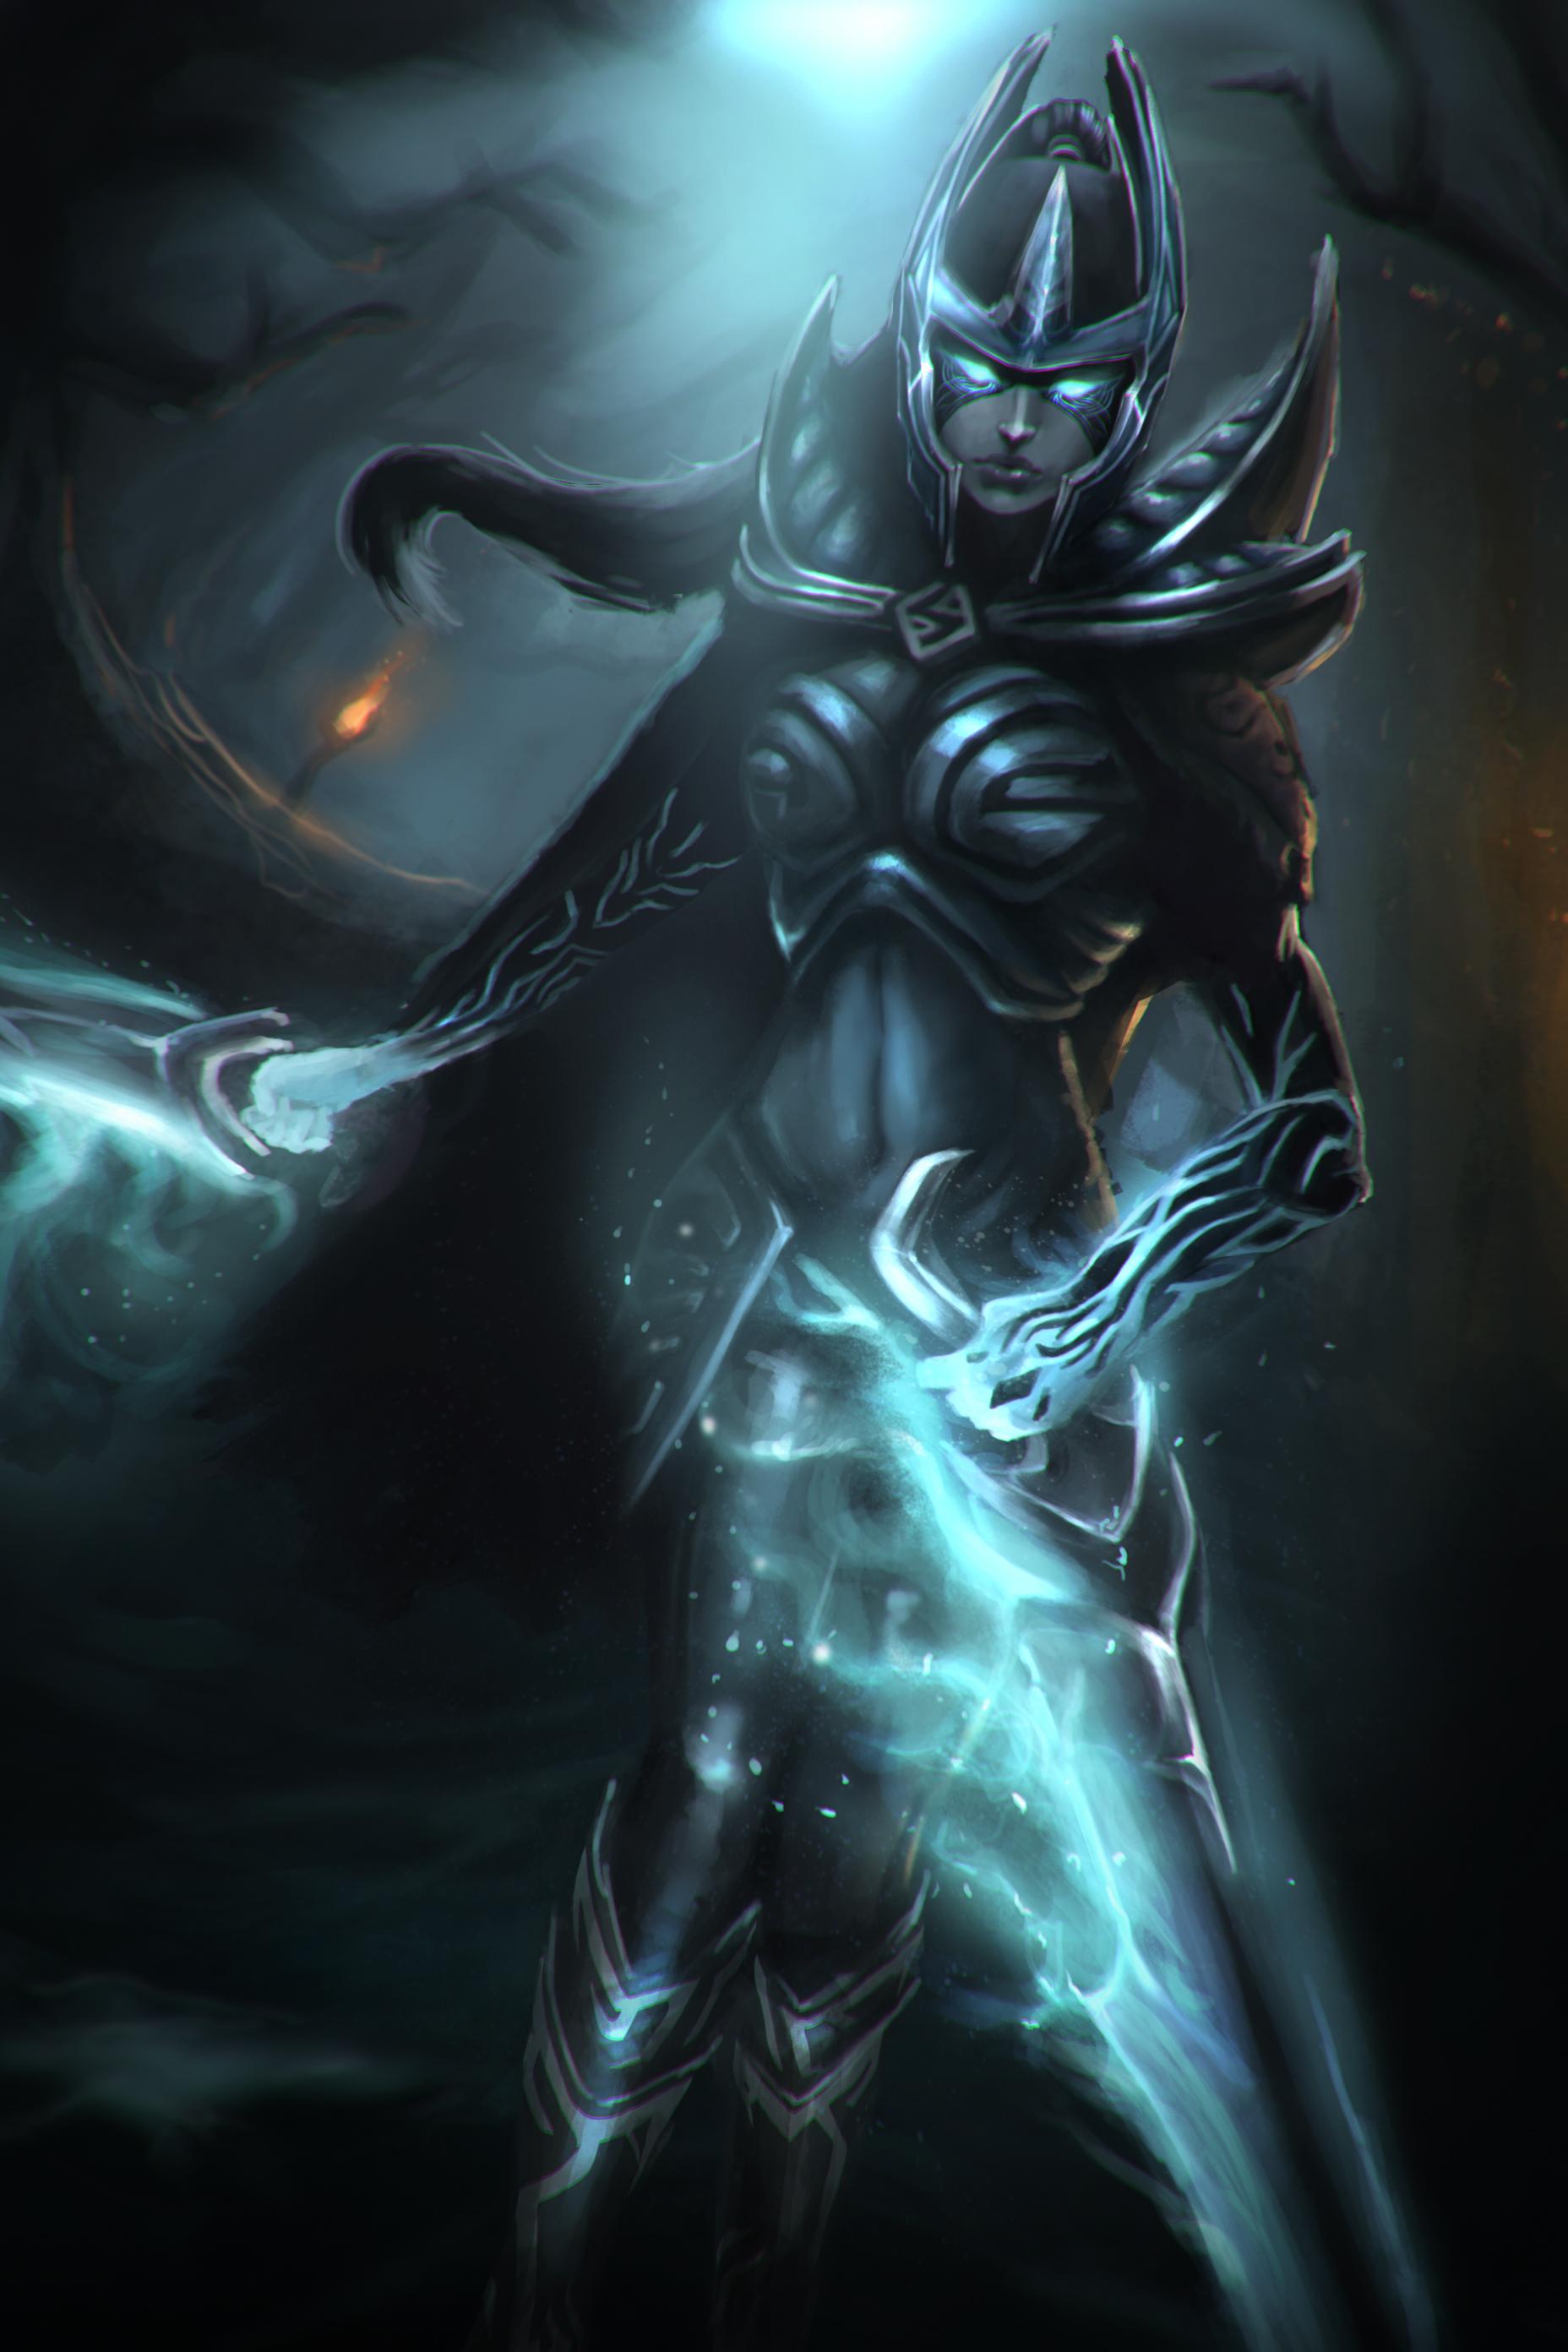 dota2 phantom assassin by pheature on newgrounds